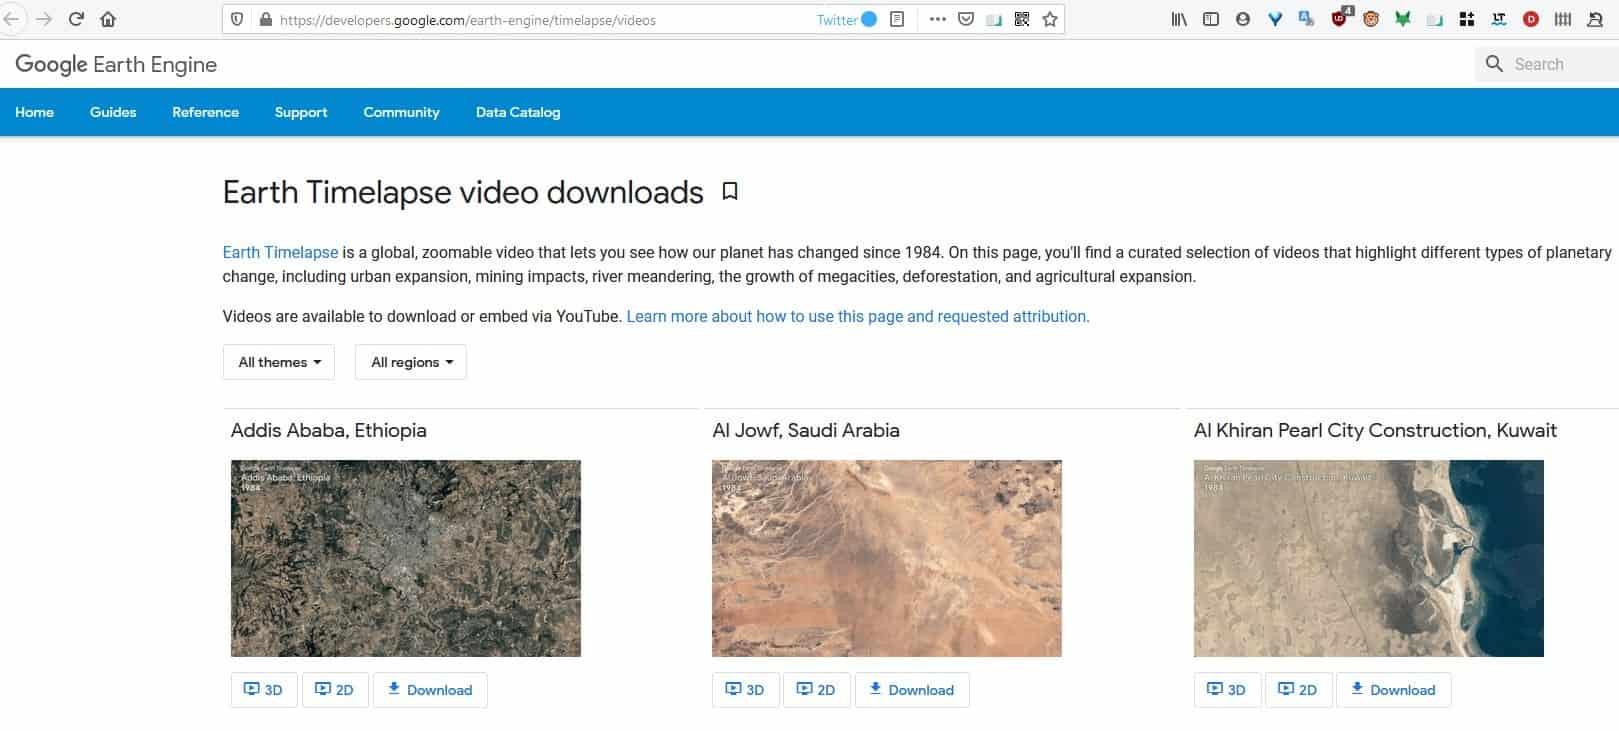 Google Earth Timelapse videos